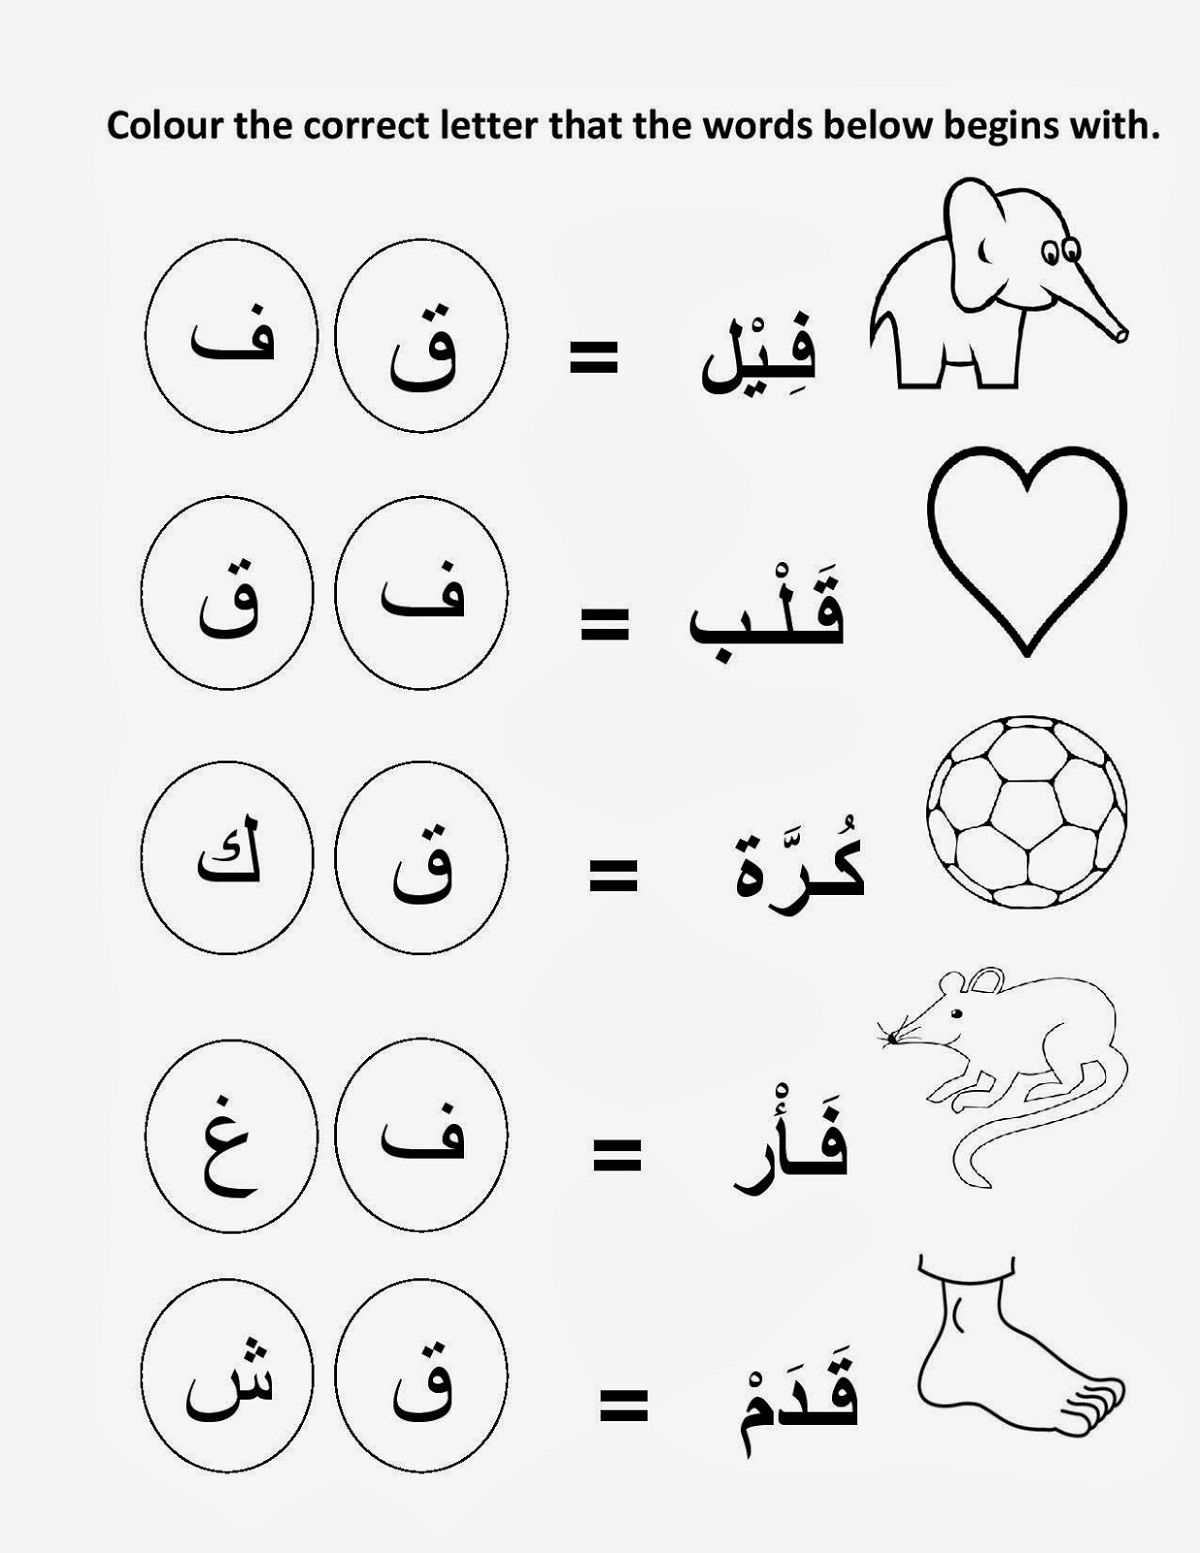 Arabic Alphabet Worksheet Printable In 2020 Arabic Alphabet Arabic Worksheets Arabic Alphabet For Kids